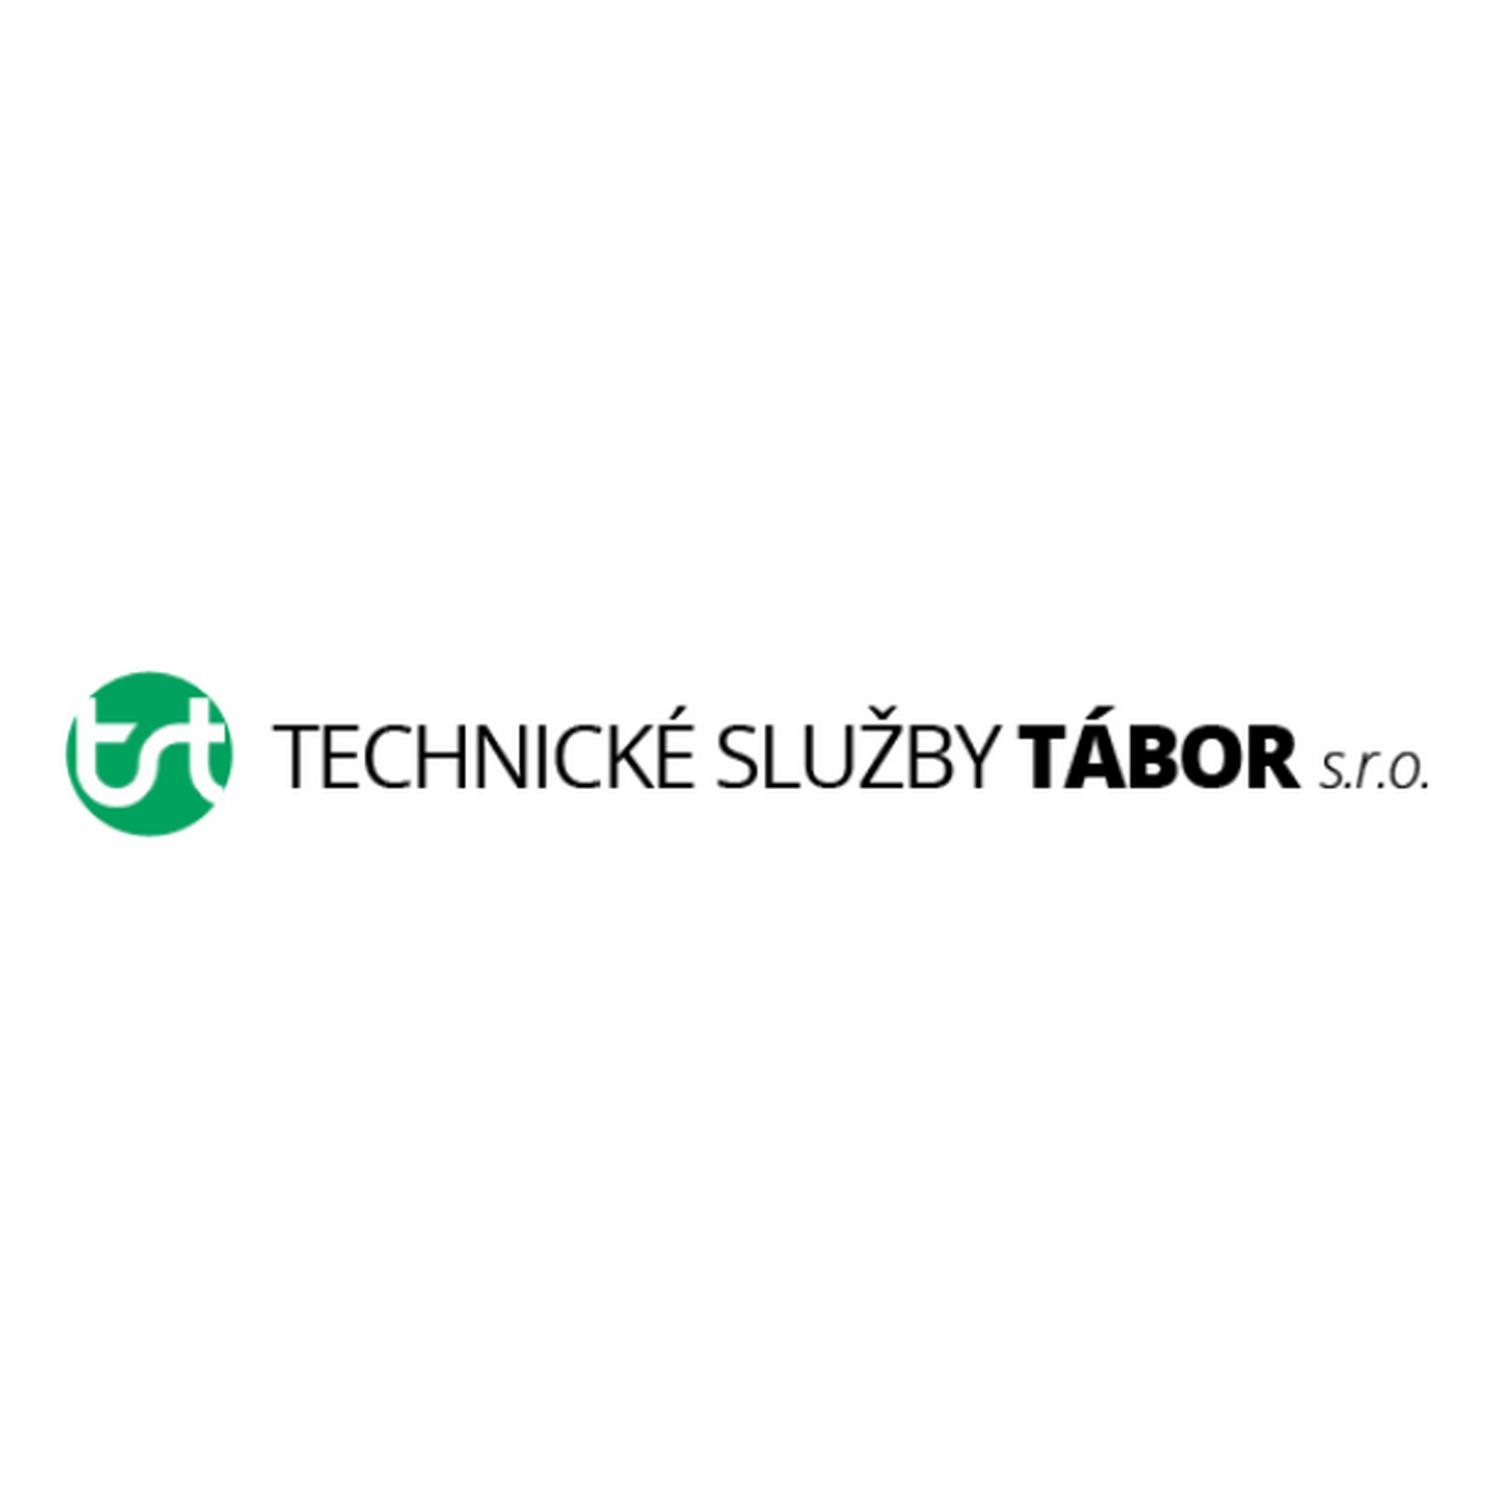 Technické služby Tábor s.r.o. Logo